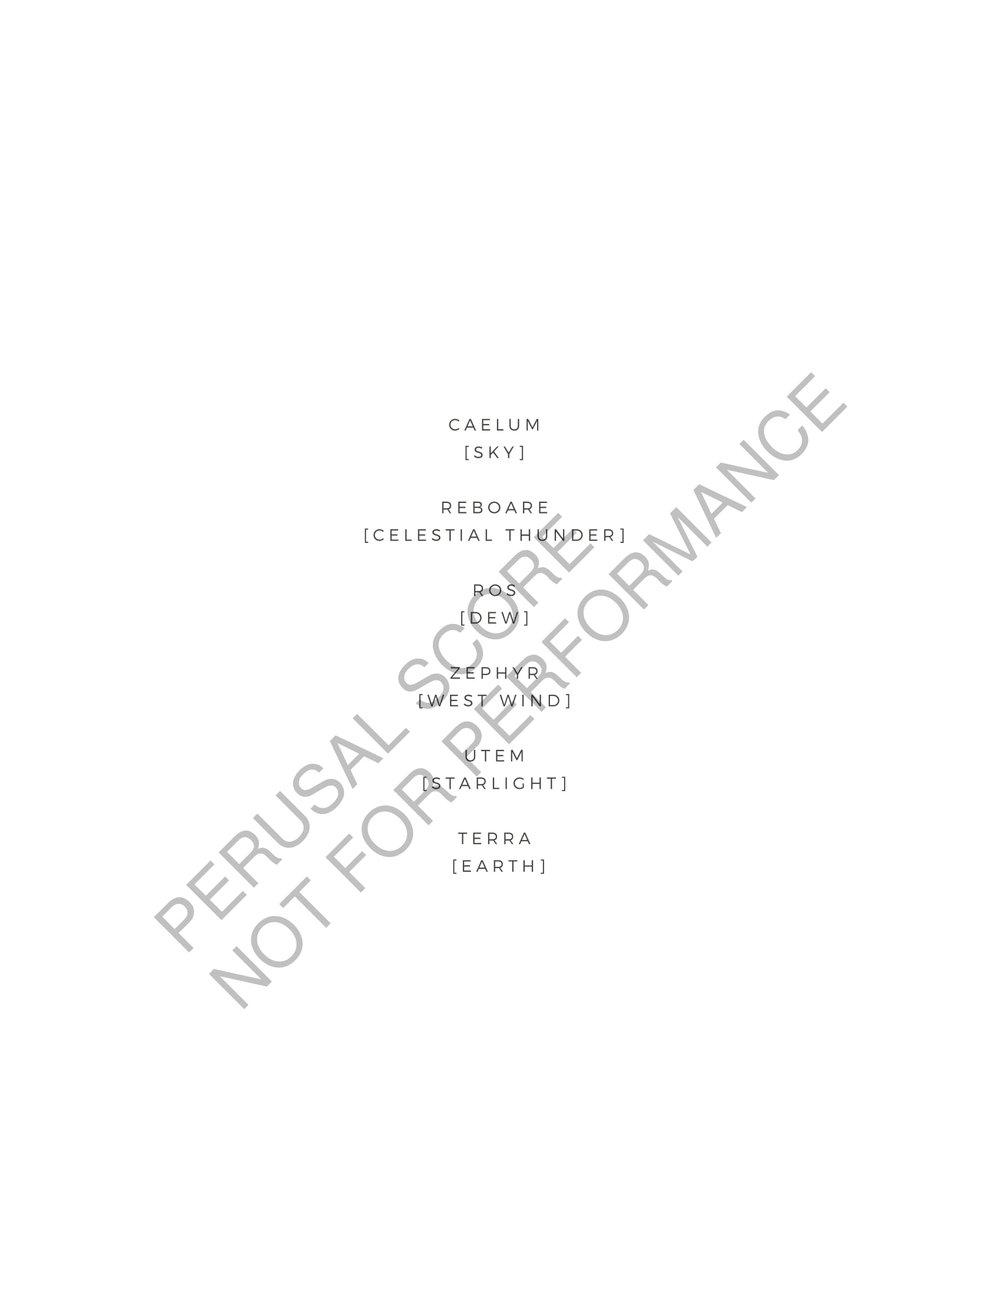 Boyd Terra Liberi Score-watermark-06.jpg